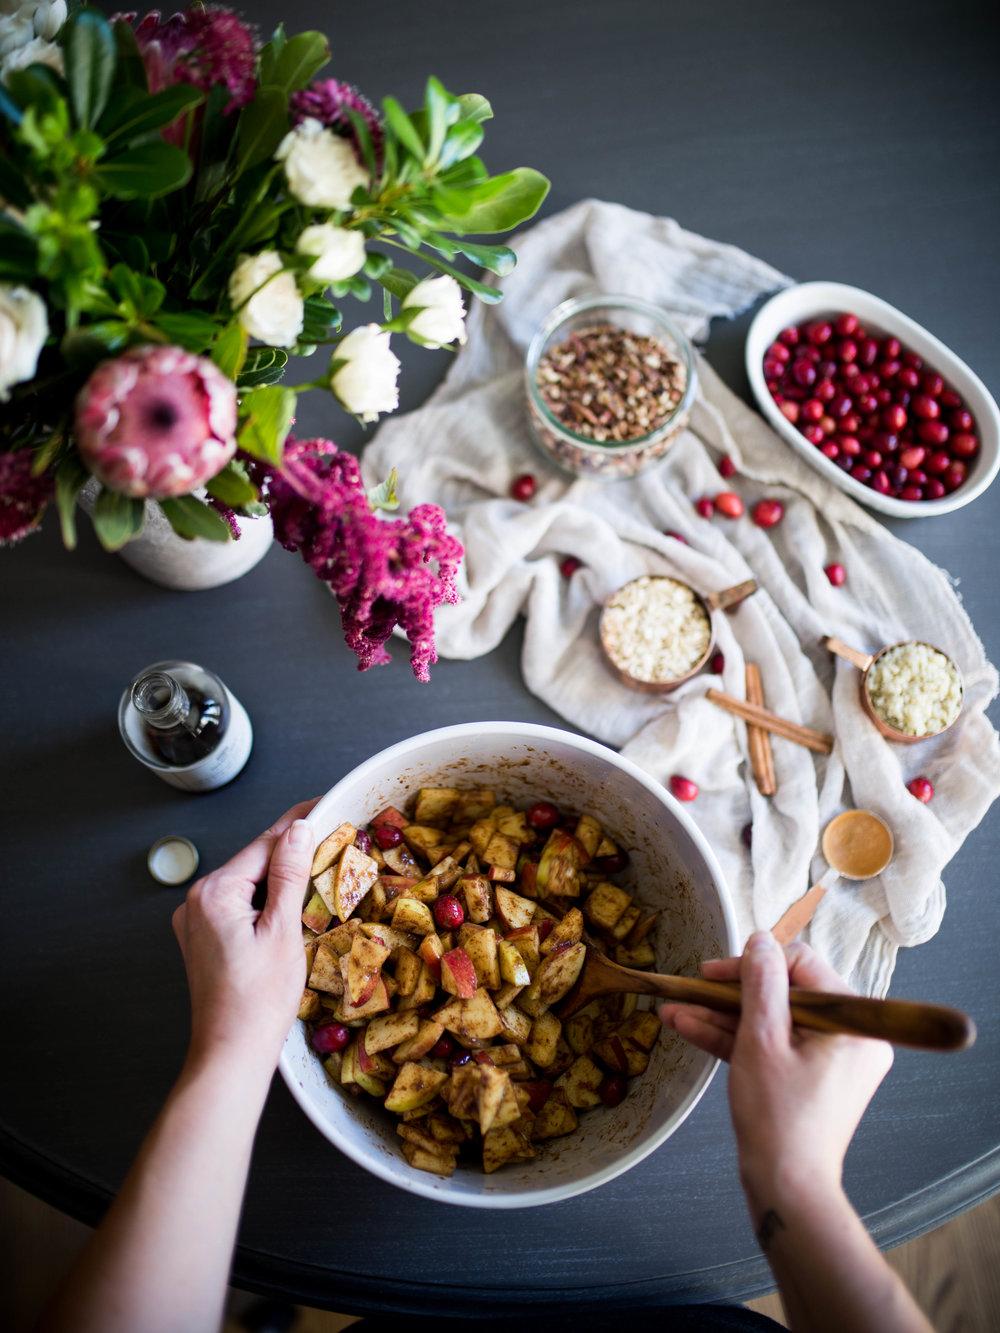 Gluten Free Cranberry Apple Crisp with Athleta | Jennifer Diaz | Holiday Recipes | Healthy Desserts | Gluten Free Desserts | Apple Pie | Thanksgiving Recipe